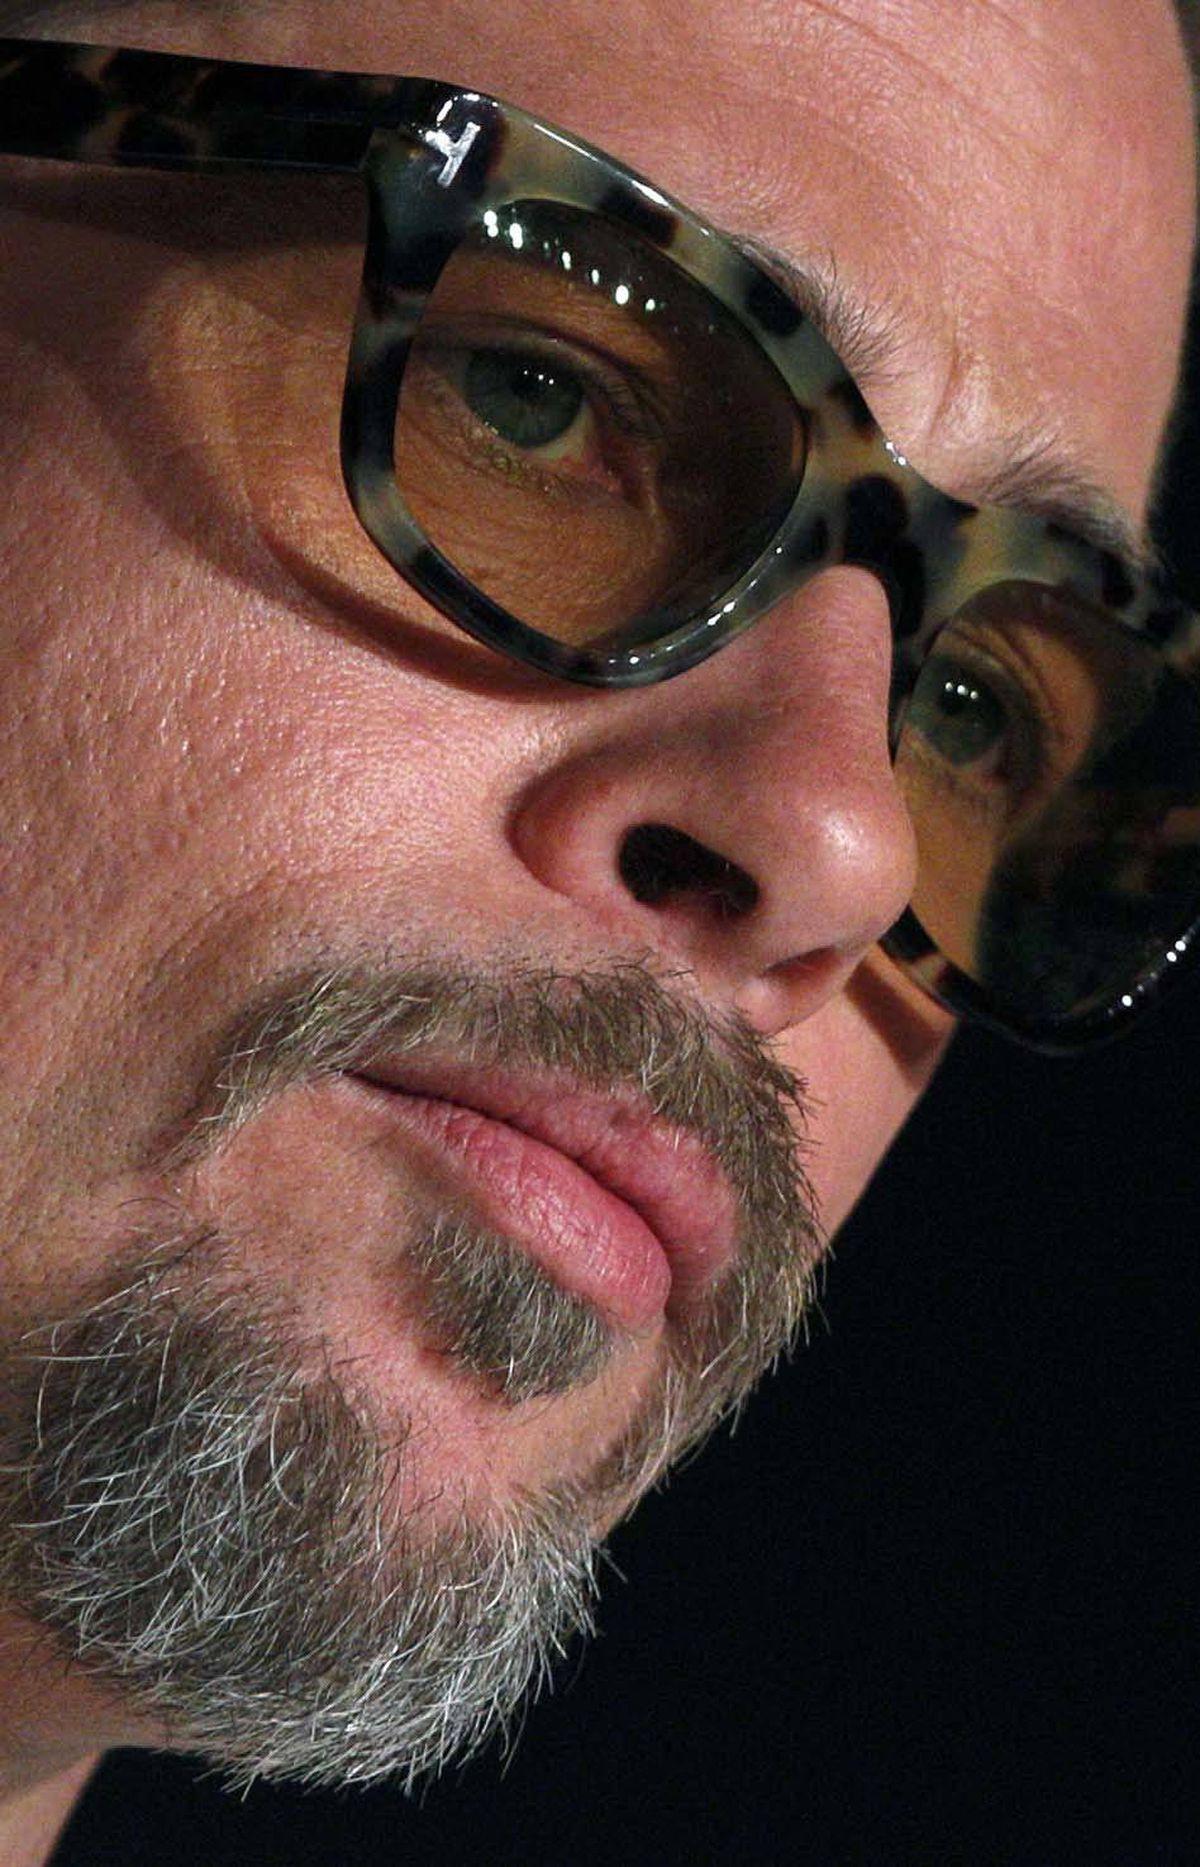 Brad Pitt has grey in his beard. The end.